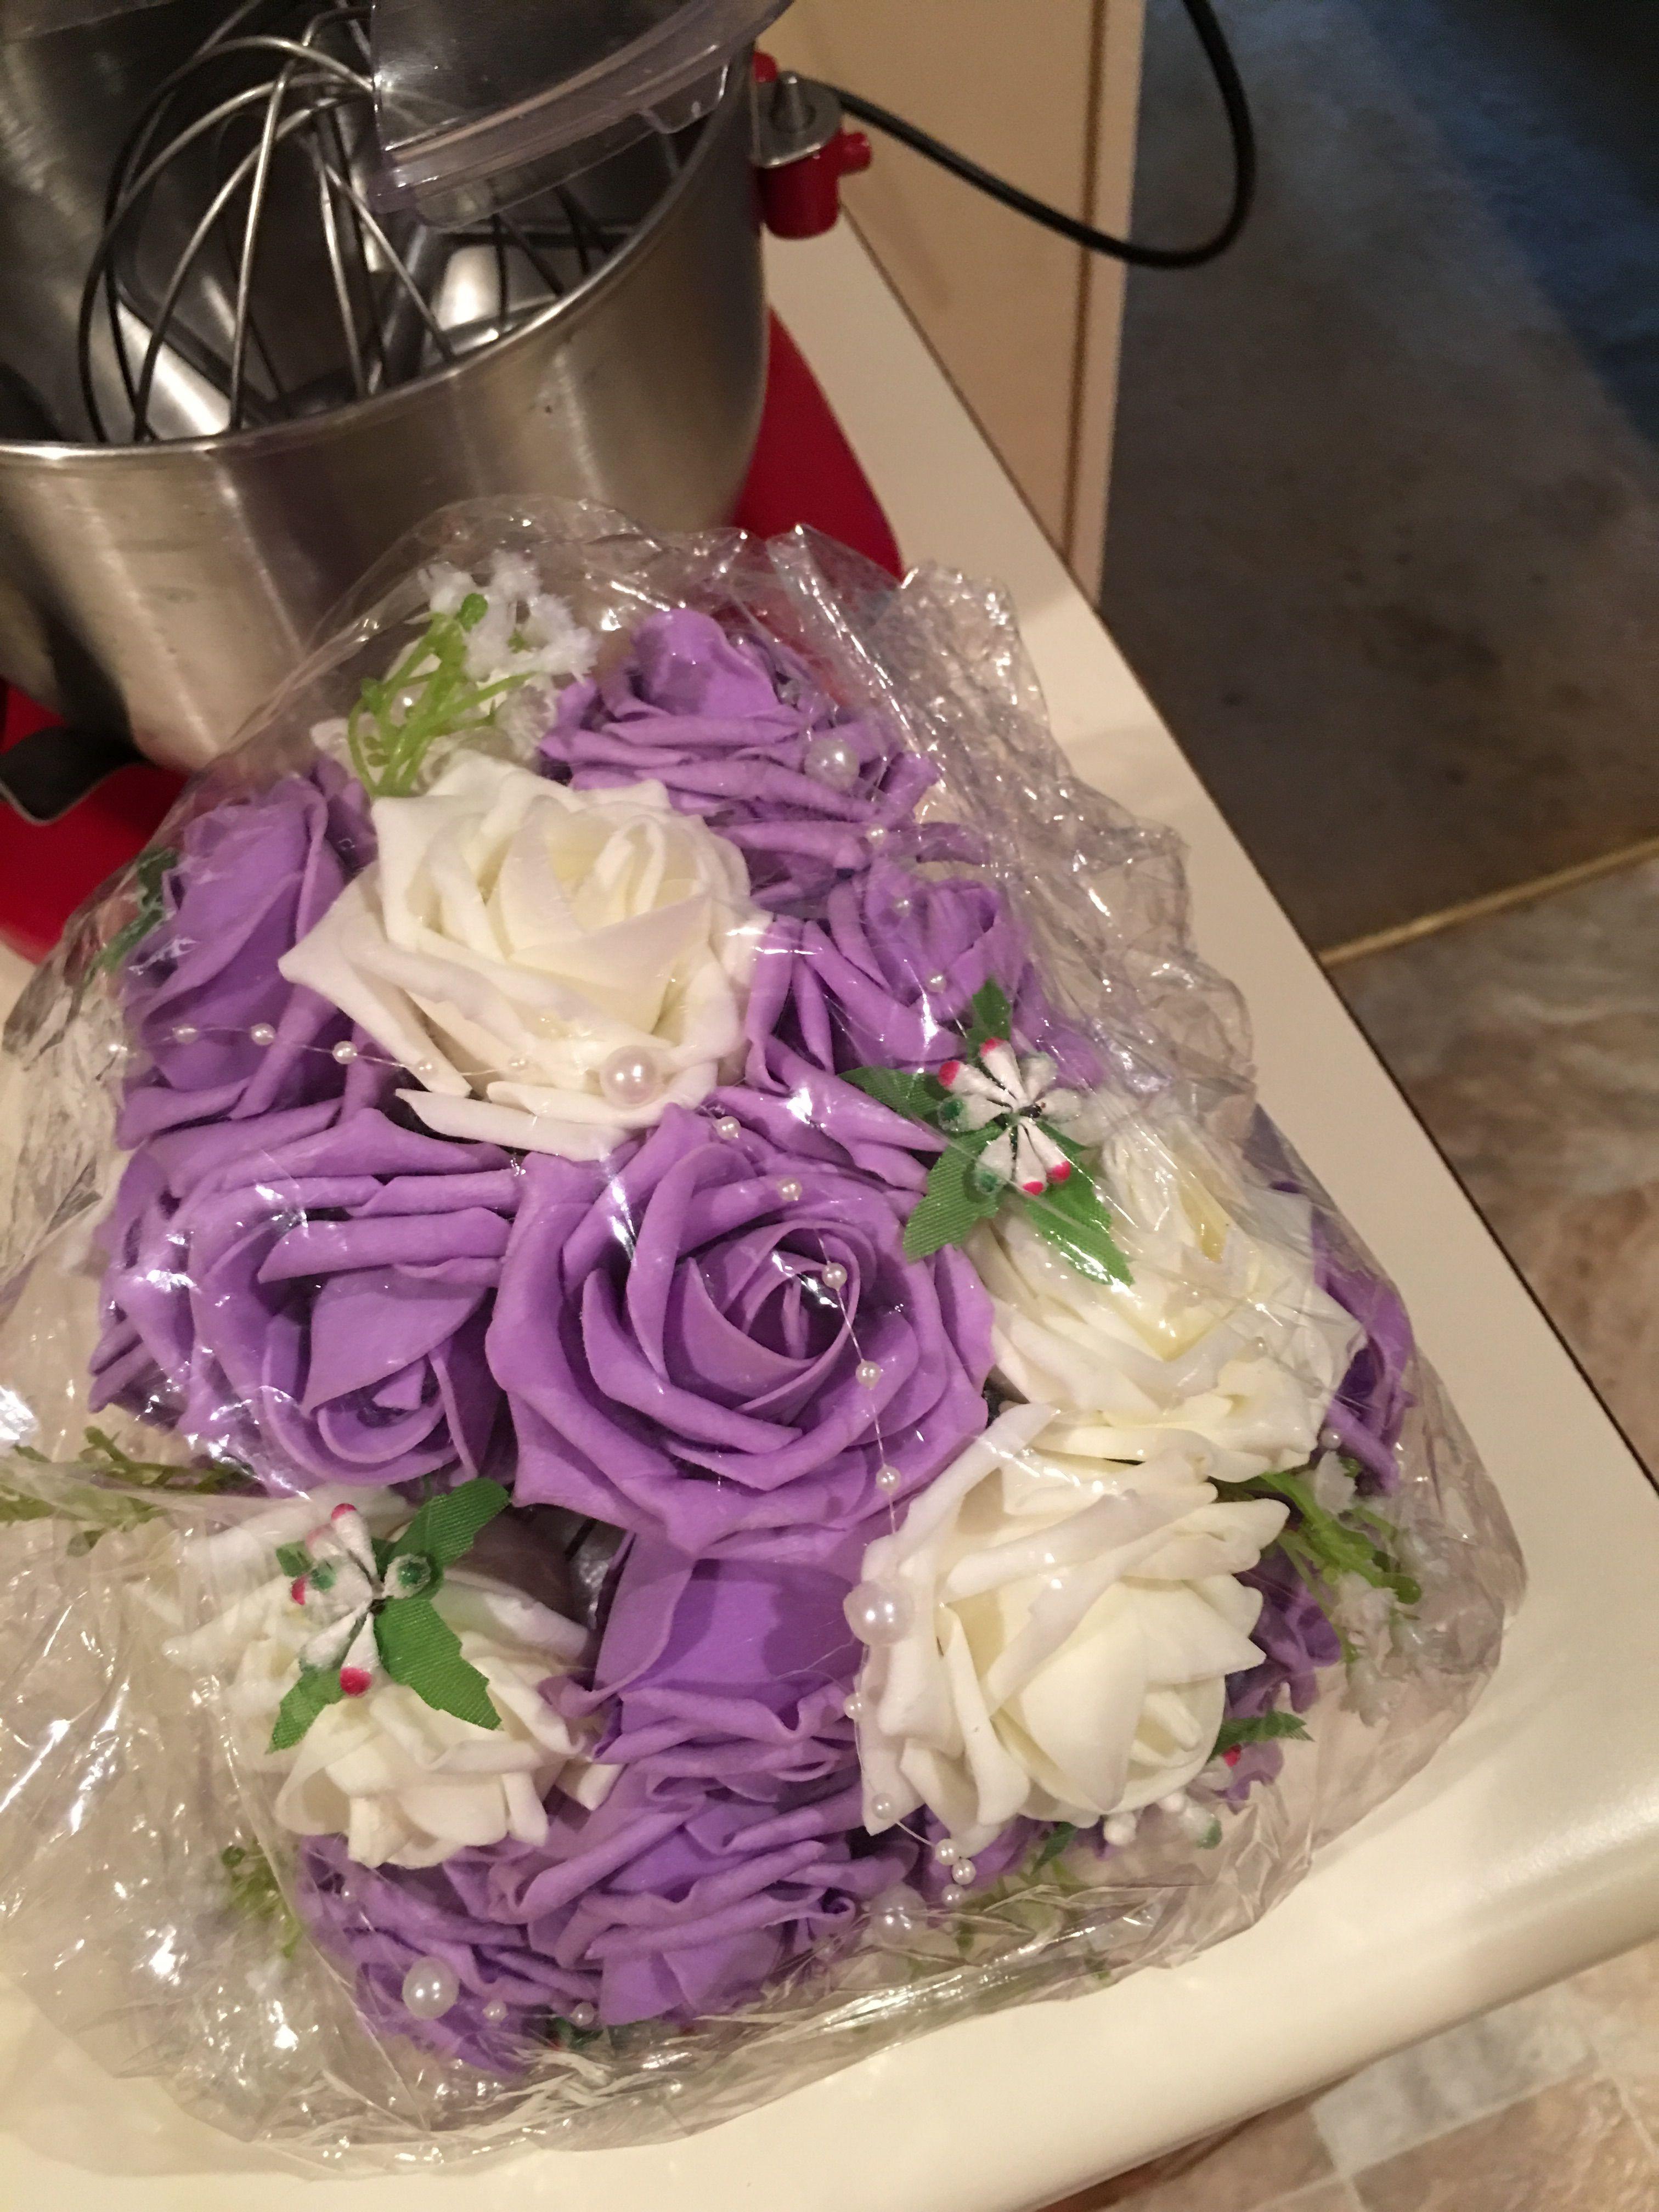 Cheap wedding flowers online silk wedding bouquets ericdress cheap wedding flowers online silk wedding bouquets ericdress izmirmasajfo